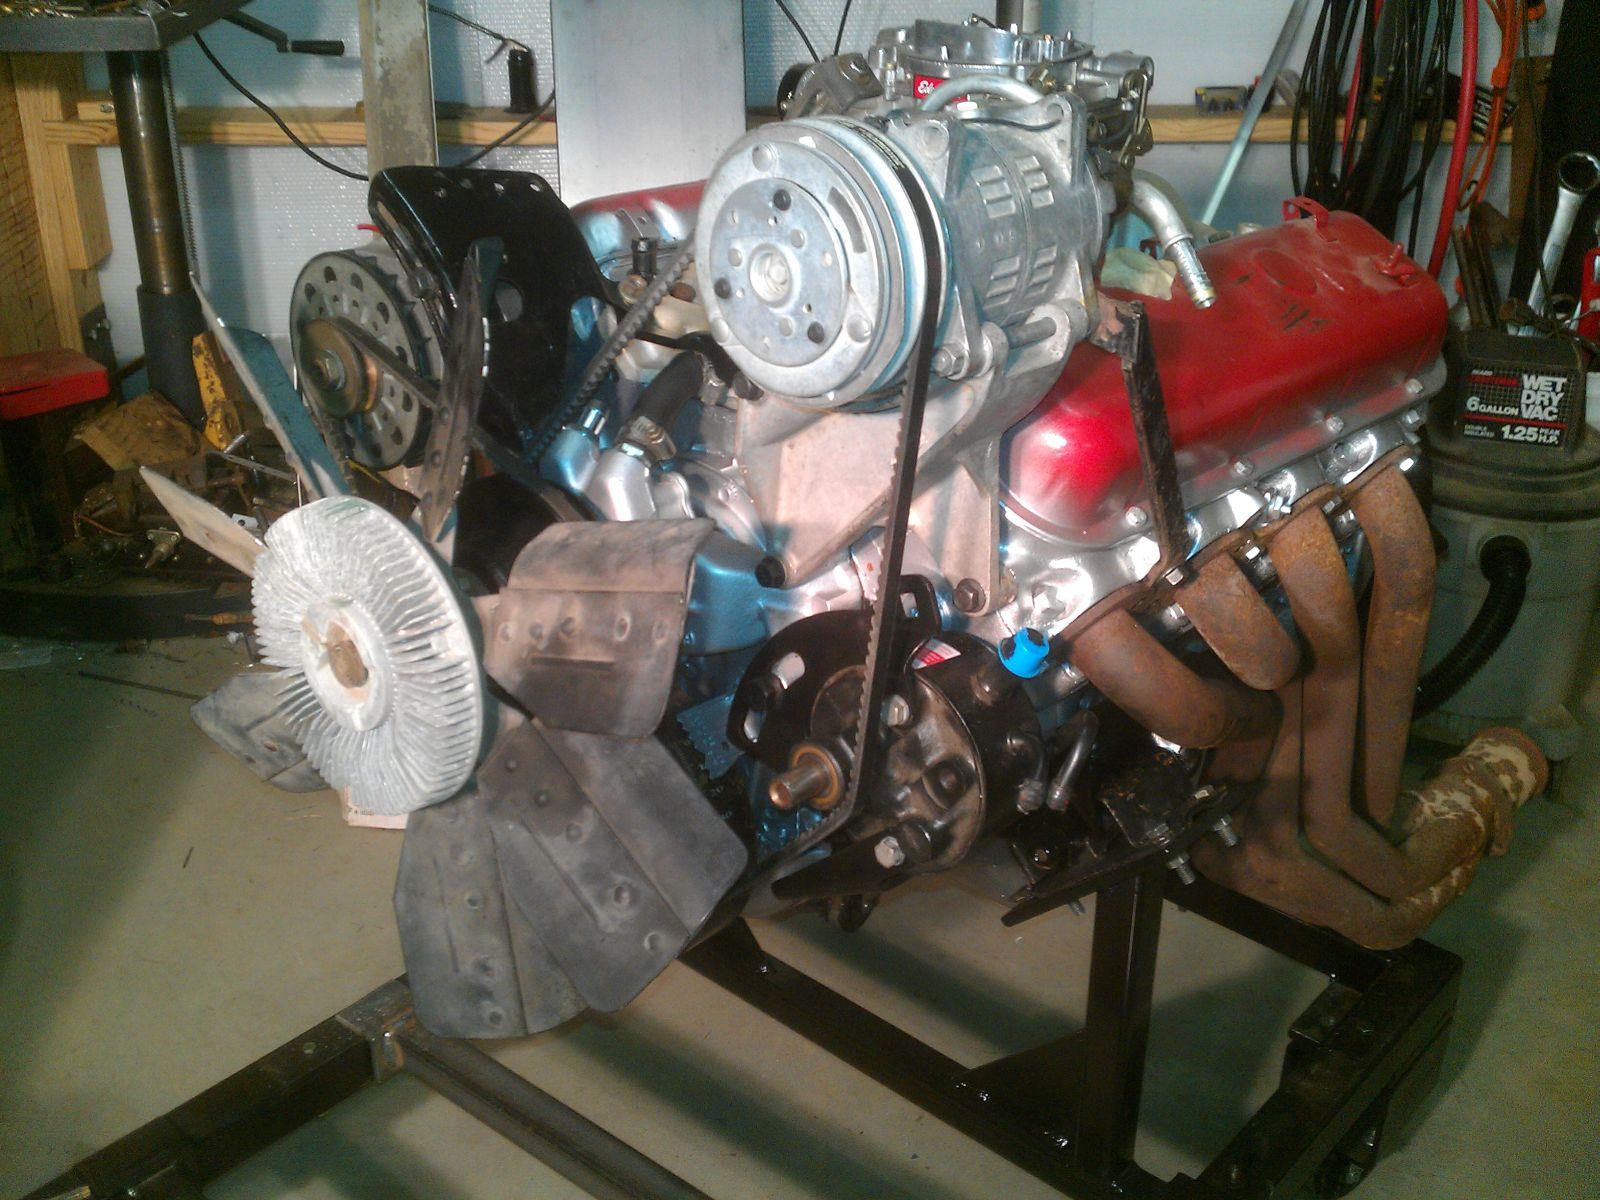 Click image for larger version  Name:74-argosy-engine-side-ac-alt-1.jpg Views:85 Size:324.5 KB ID:178179